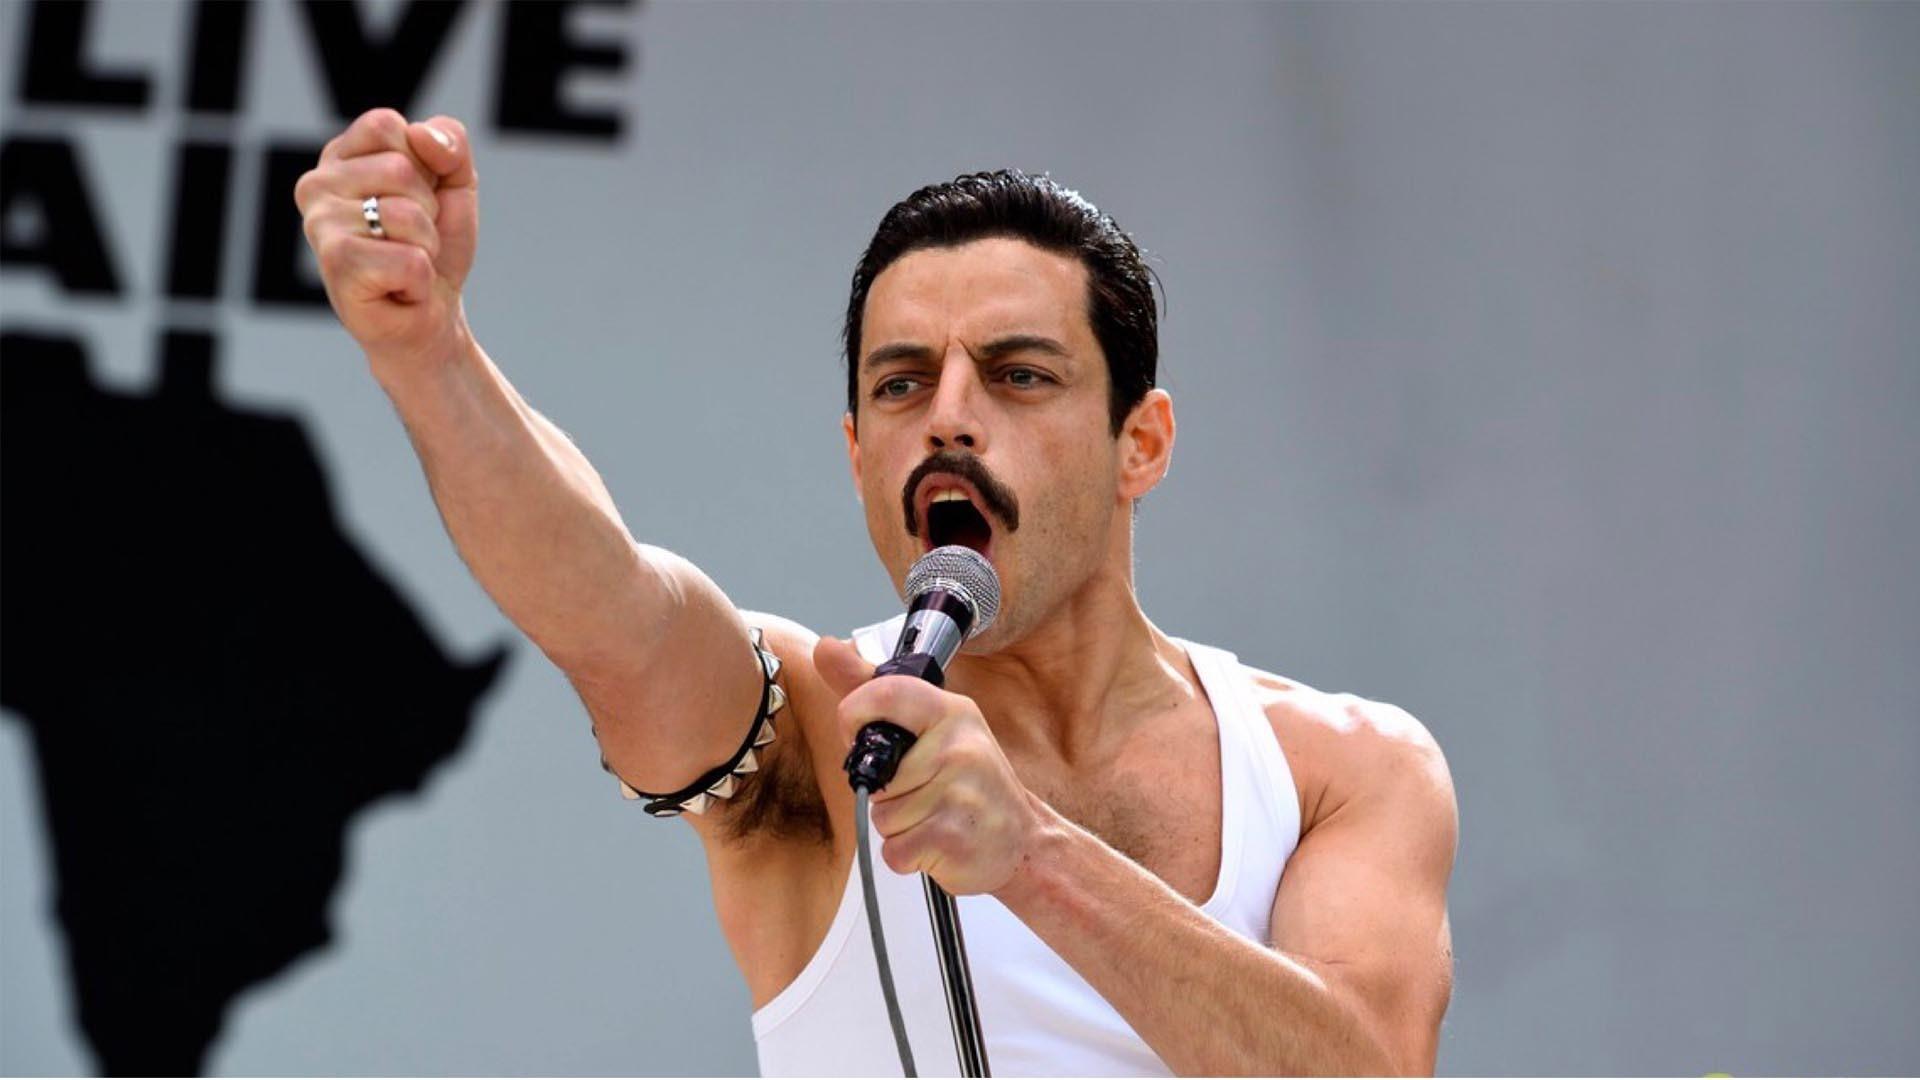 Rami Malek As Freddie Mercury In Bohemian Rhapsody Movie Wallpaper Hd Movies 4k Wallpapers Images Photos And Background Wallpapers Den